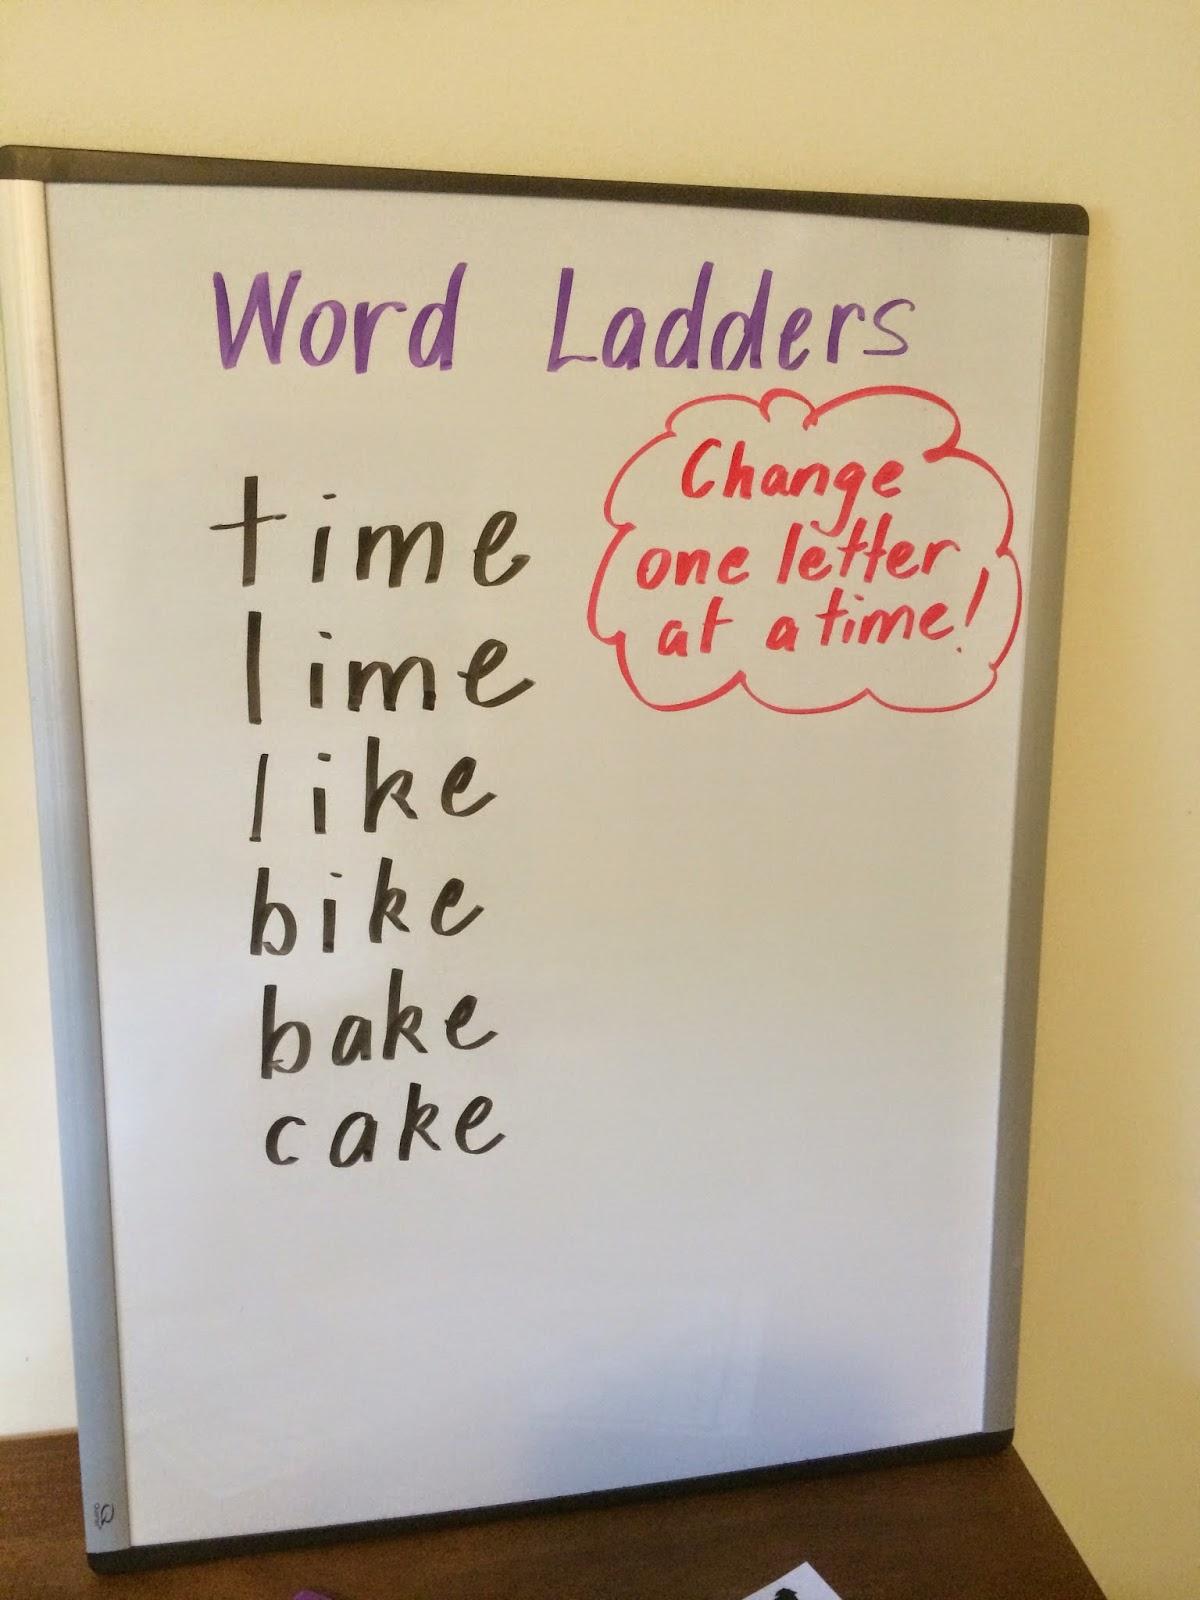 Fun Games 4 Learning: Word Ladders